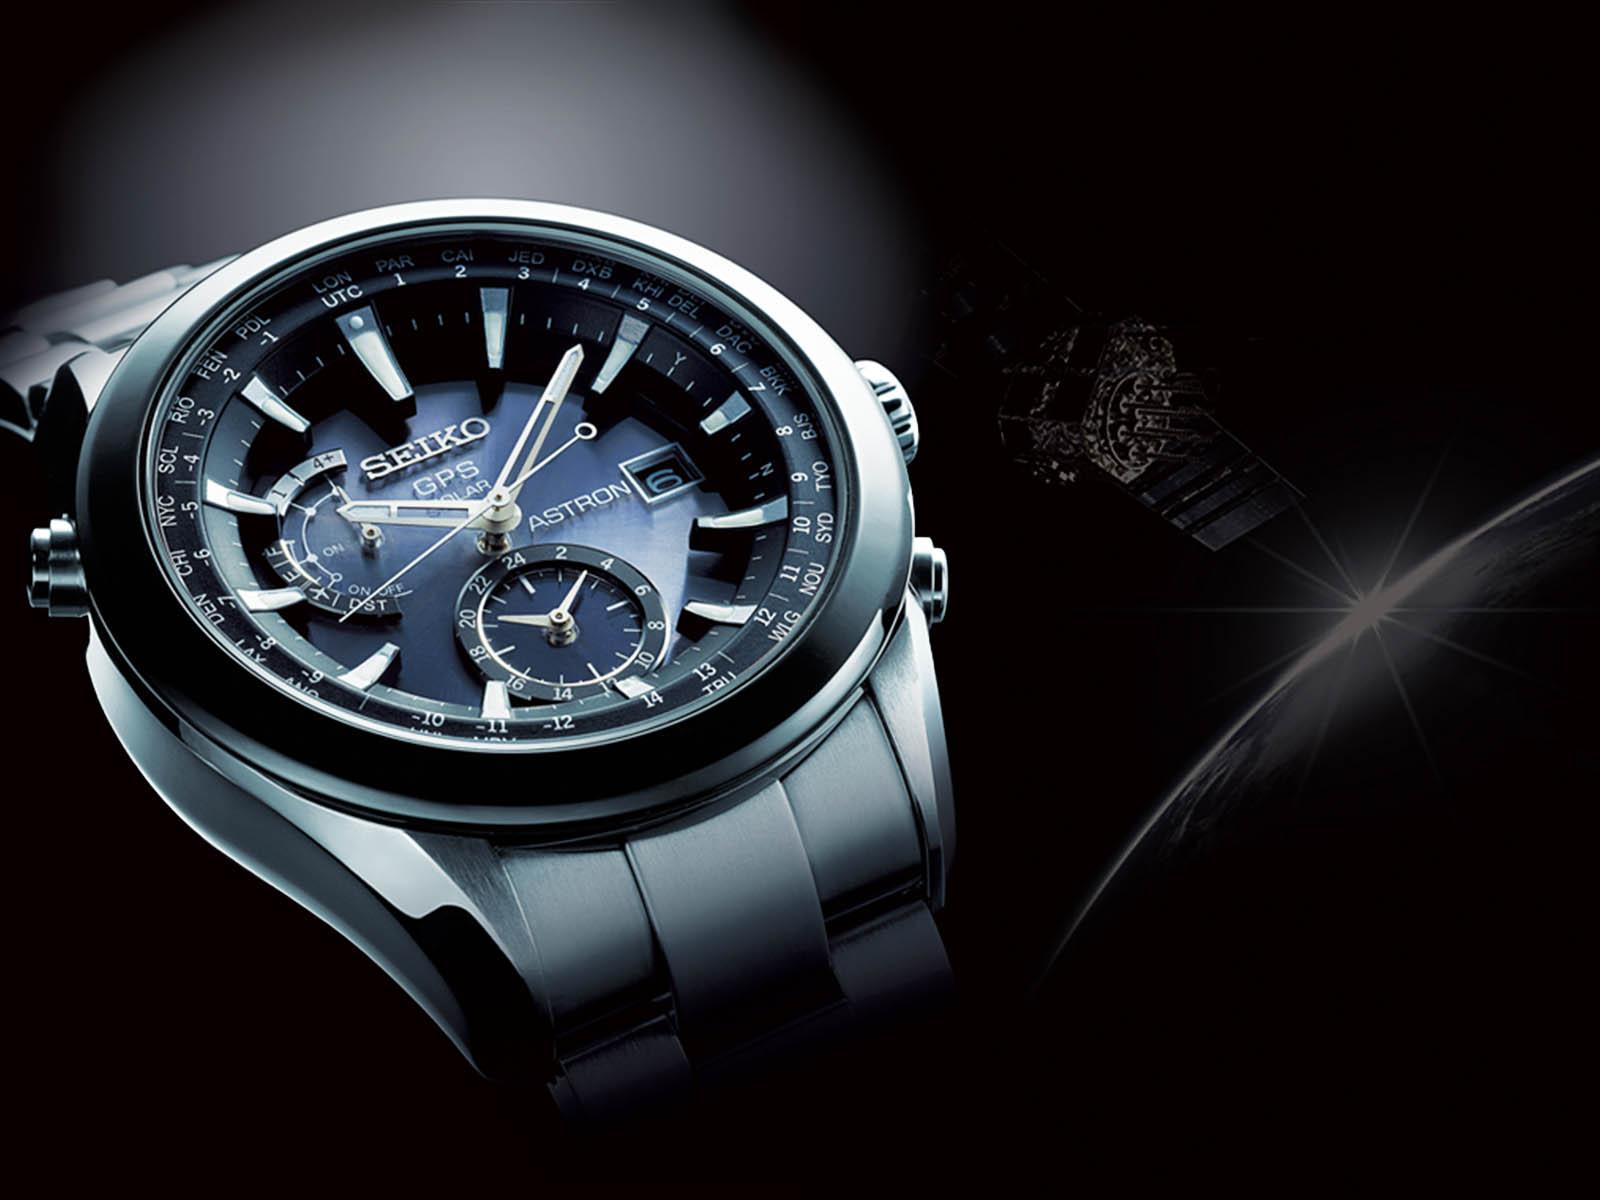 seiko-astron-gps-solar-the-world-s-first-gps-solar-watch-2012-.jpg